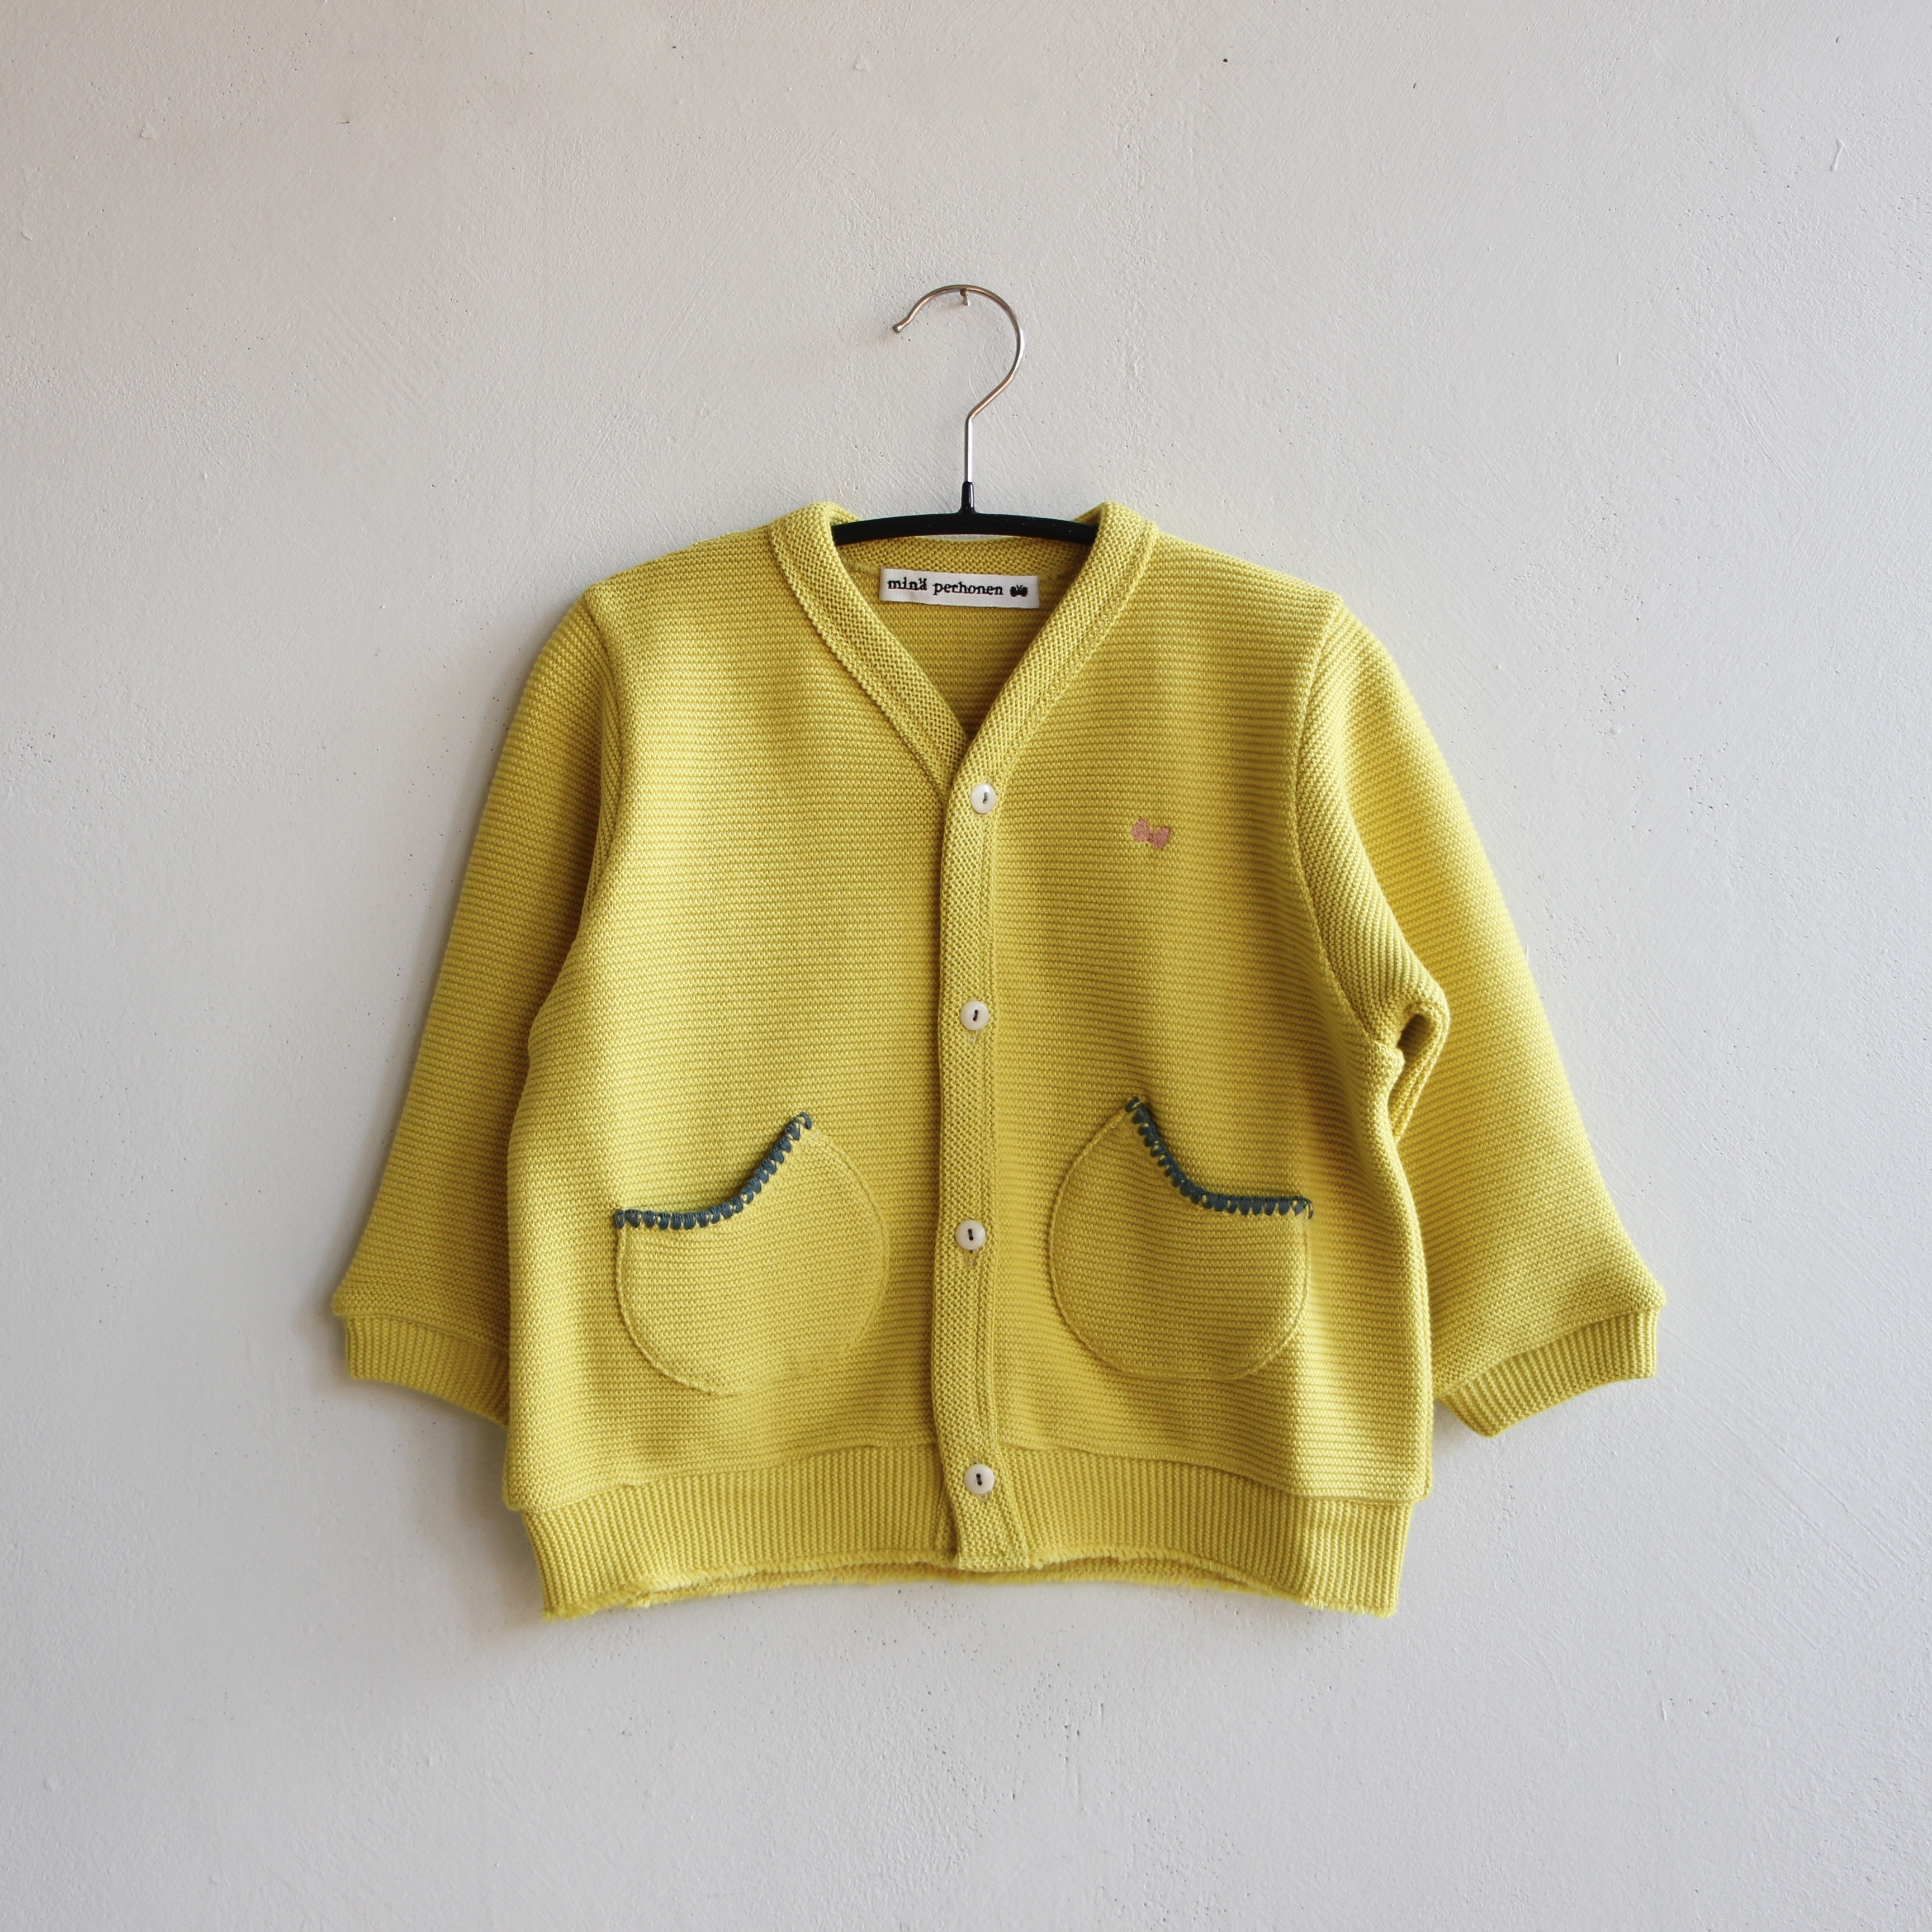 《mina perhonen 2020AW》makea カーディガン / yellow / 90cm